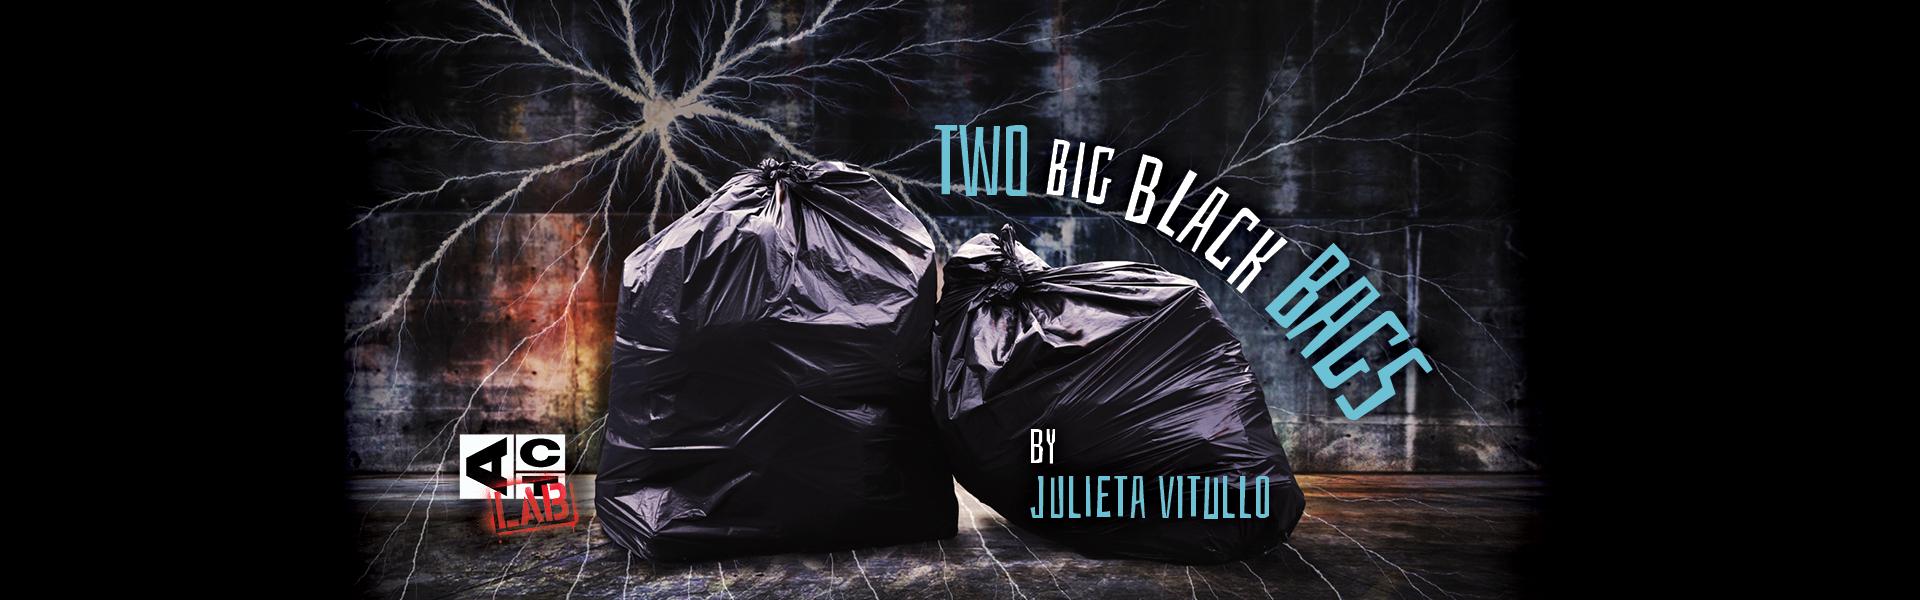 Two Big Black Bags